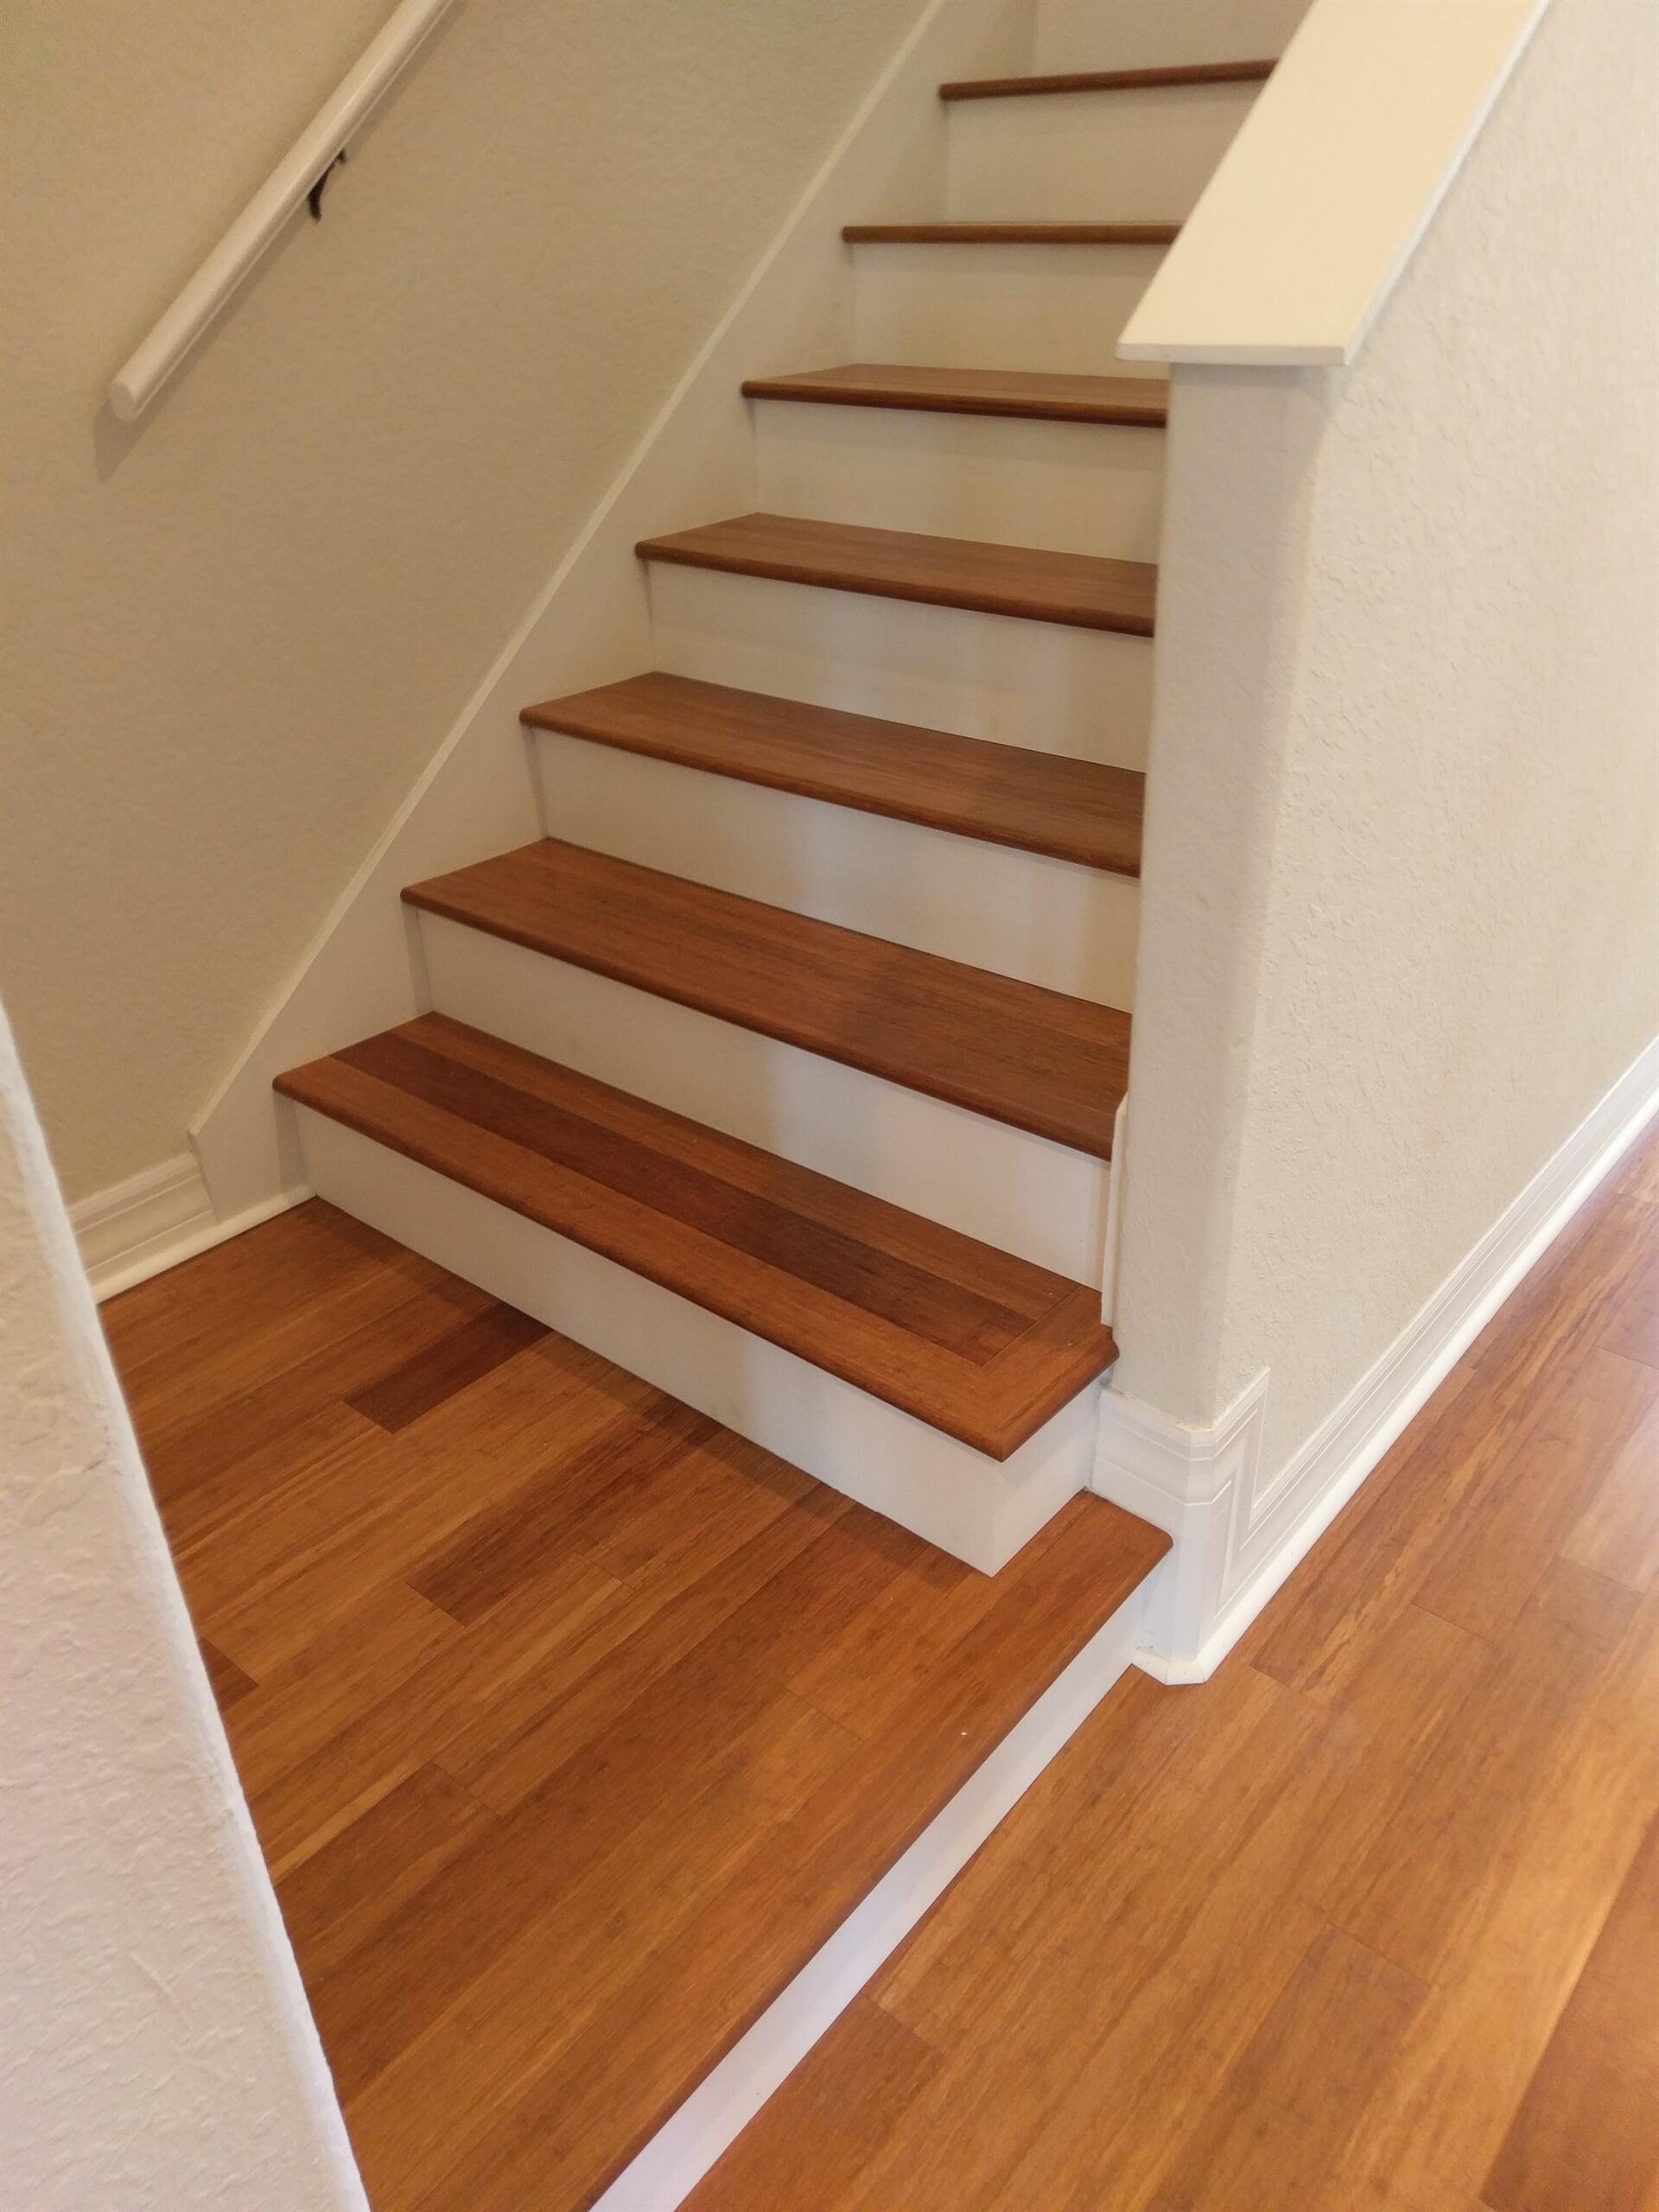 Hardwood stair landing in Dunedin, FL from Floor Depot